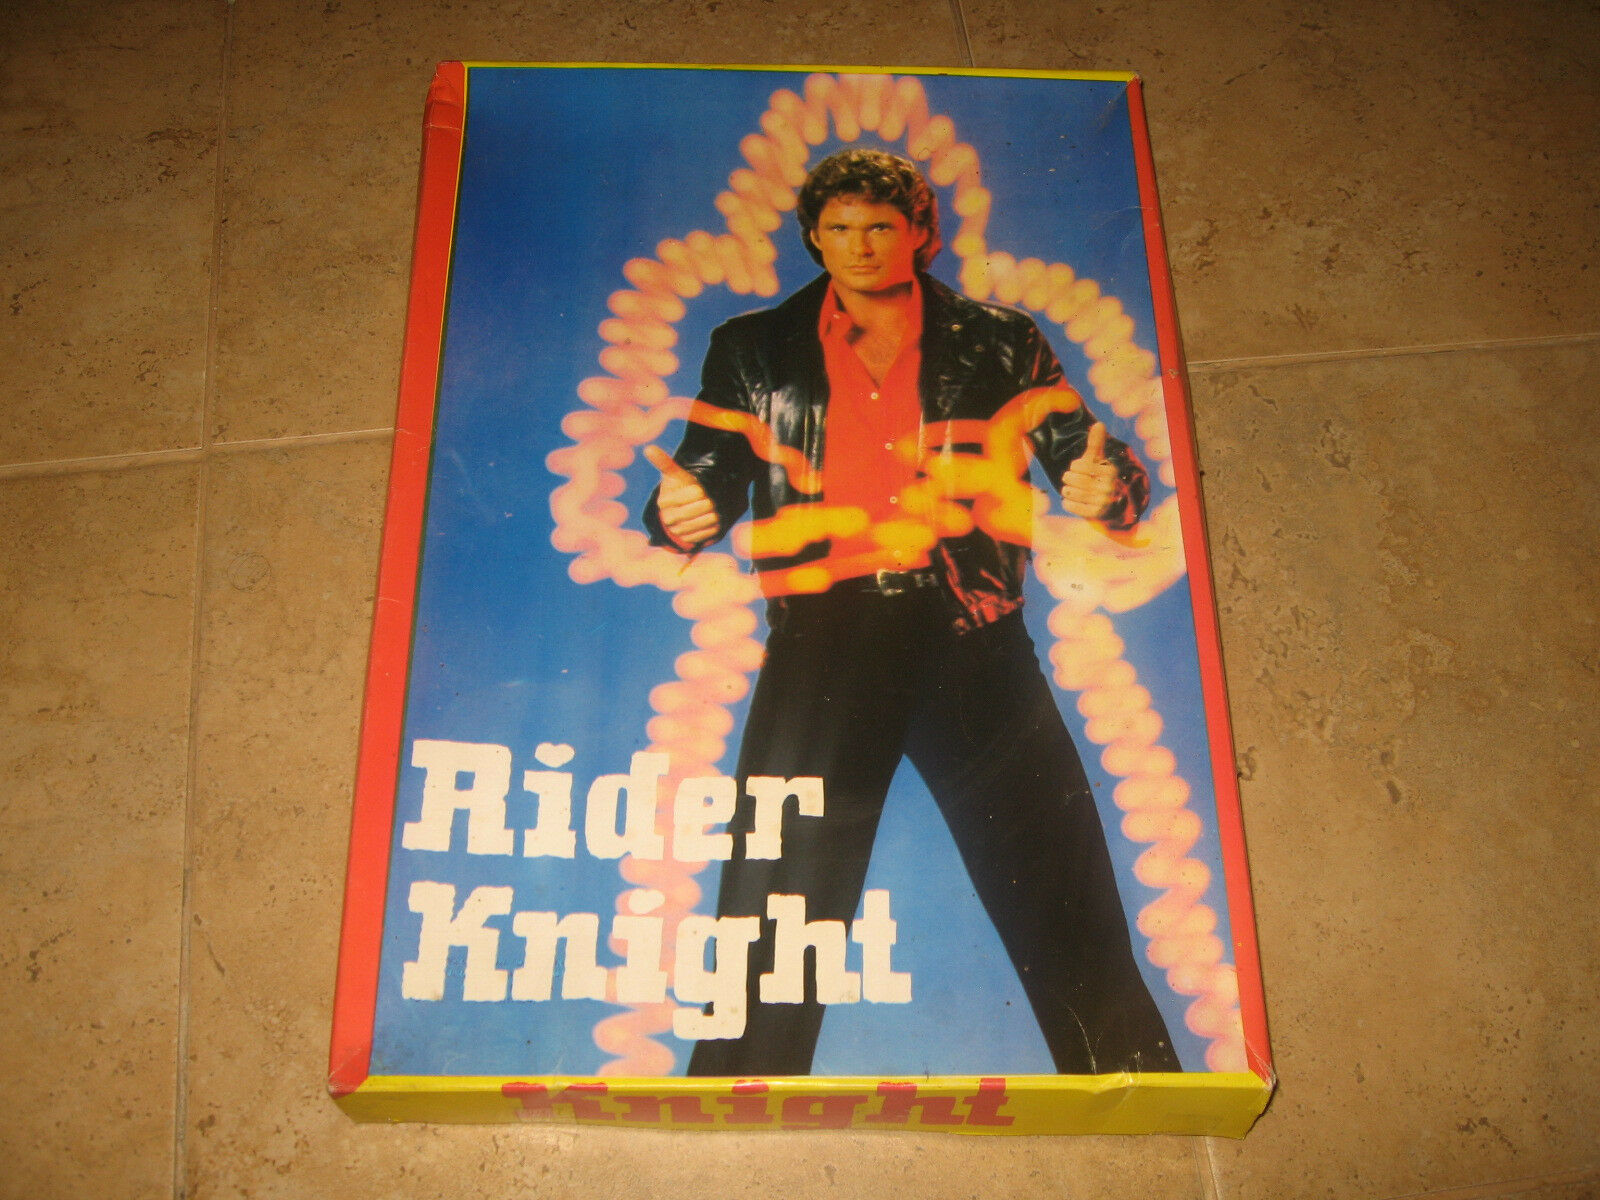 VINTAGE Très Rare Greek Board Game – Rider Knight-Série TV... NEUF